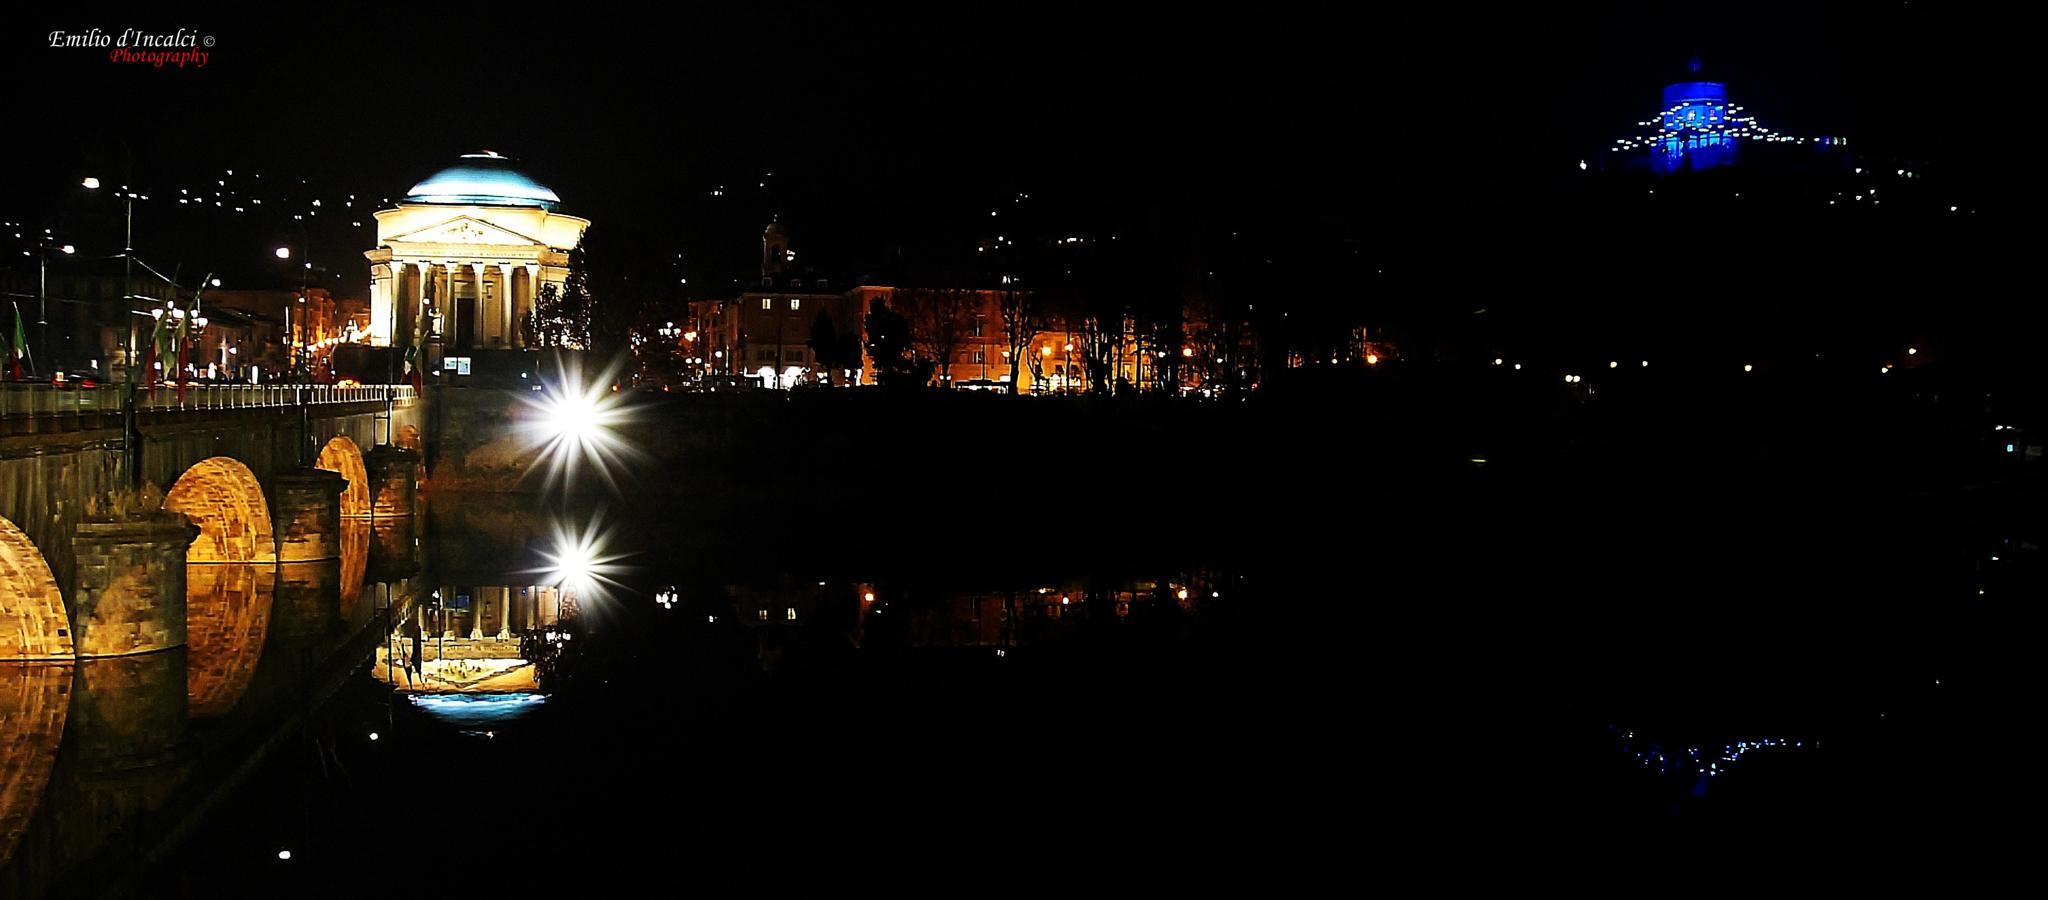 Turin by Night by Emilio d'Incalci